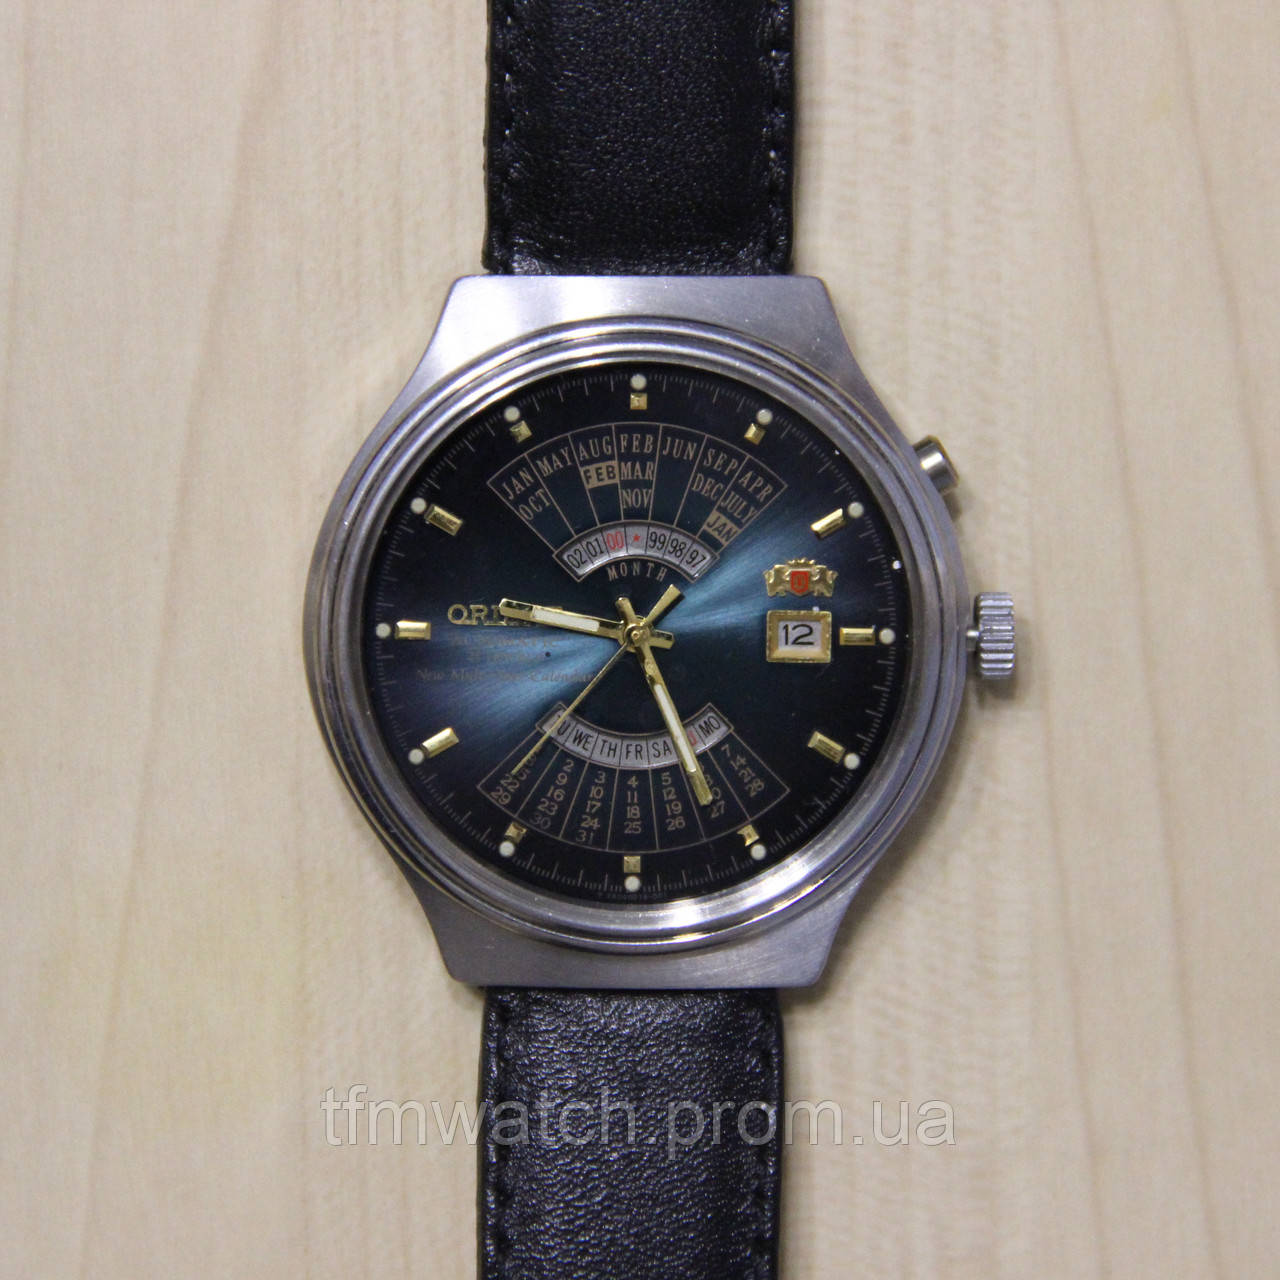 Orient Ориент Колледж мужские наручные часы  5ba52dad672ed